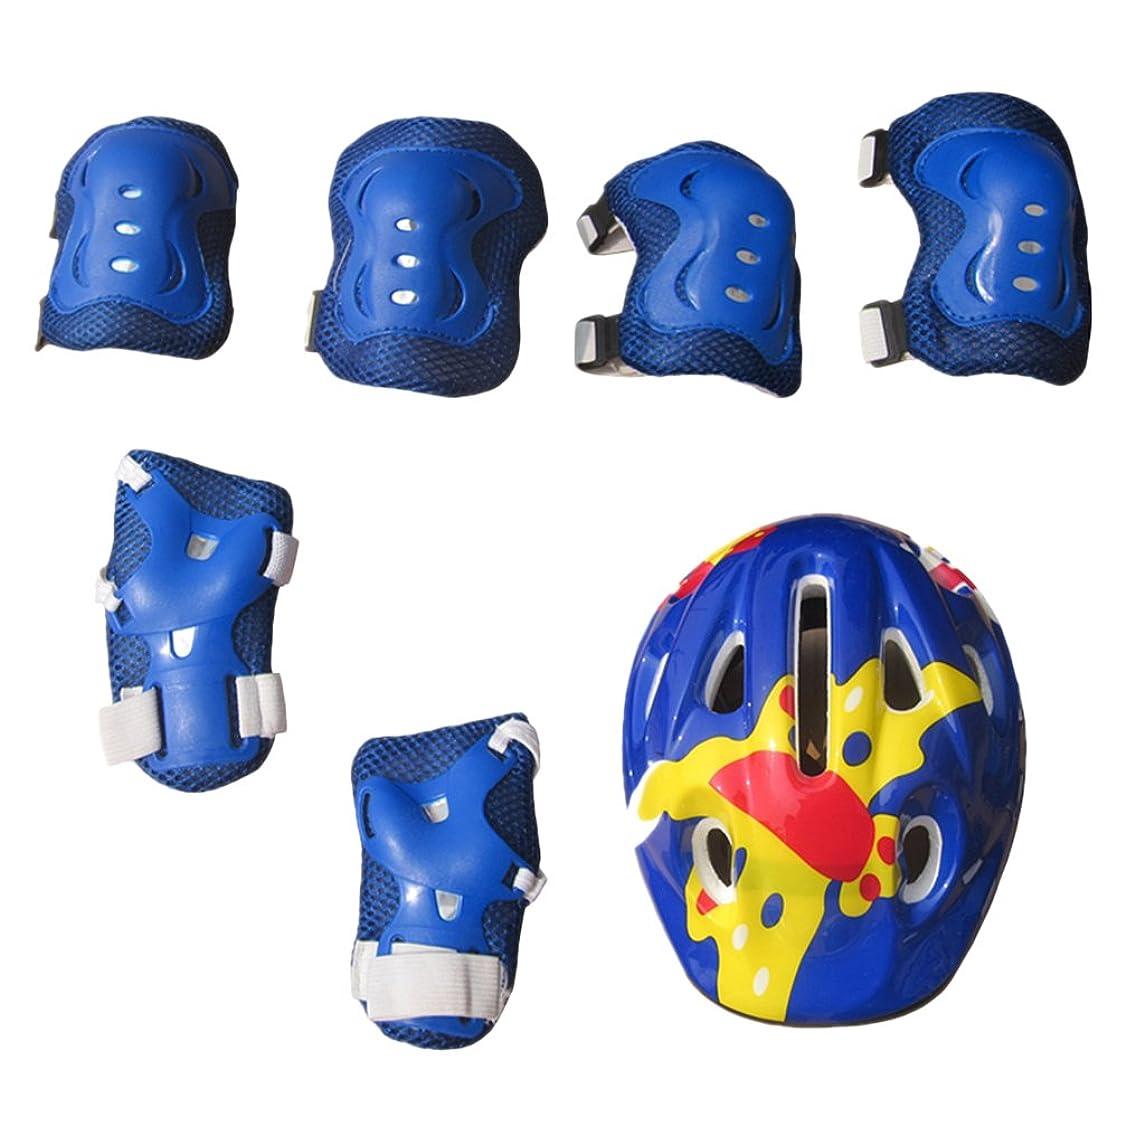 simhoa Kid Children Roller Skating Helmet Knee Wrist Guard Elbow Pad